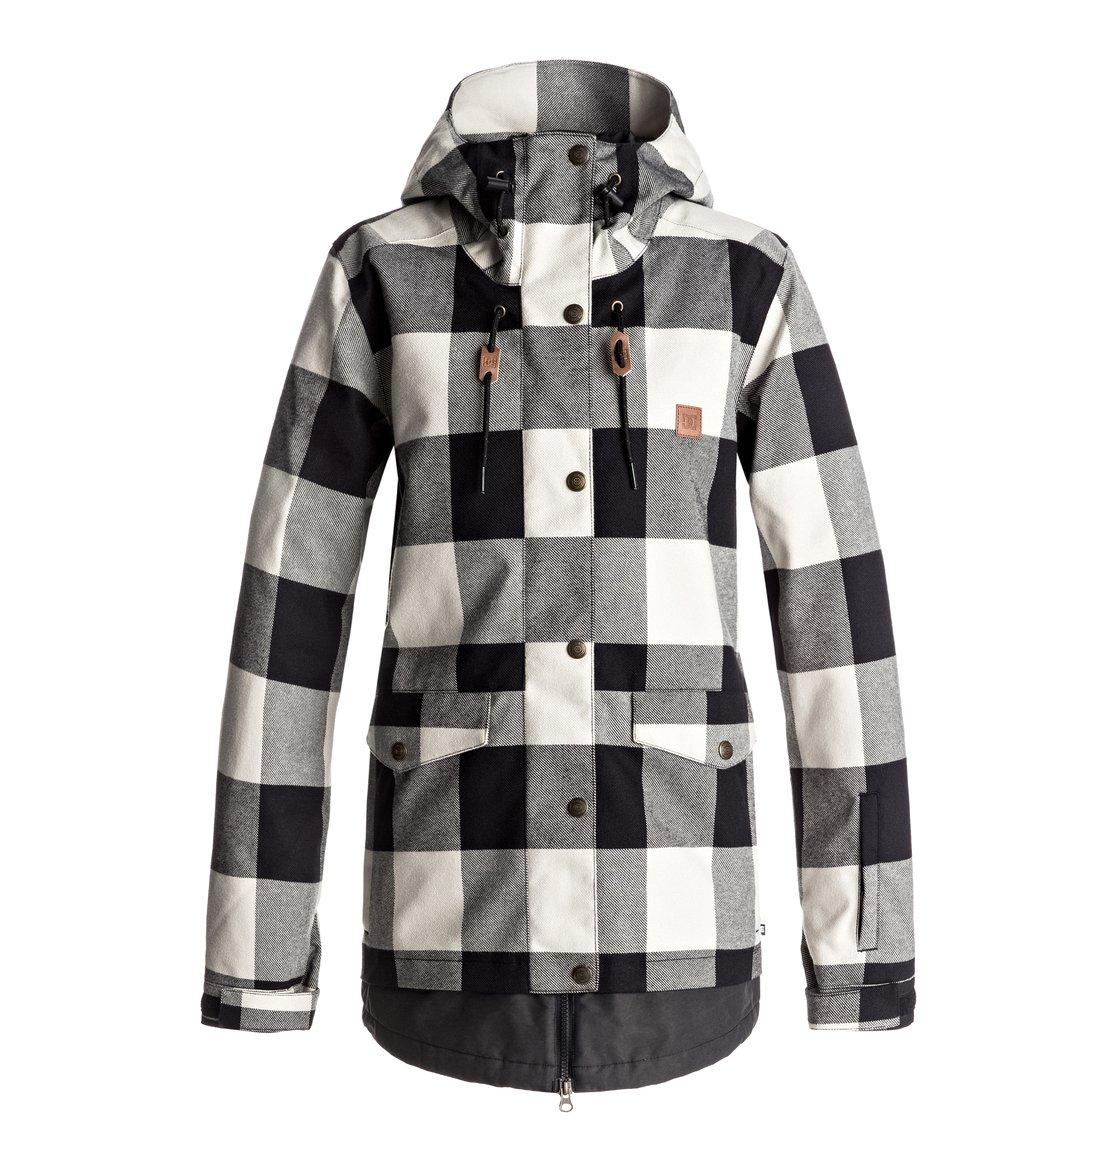 Сноубордическая куртка Riji SE от DC Shoes